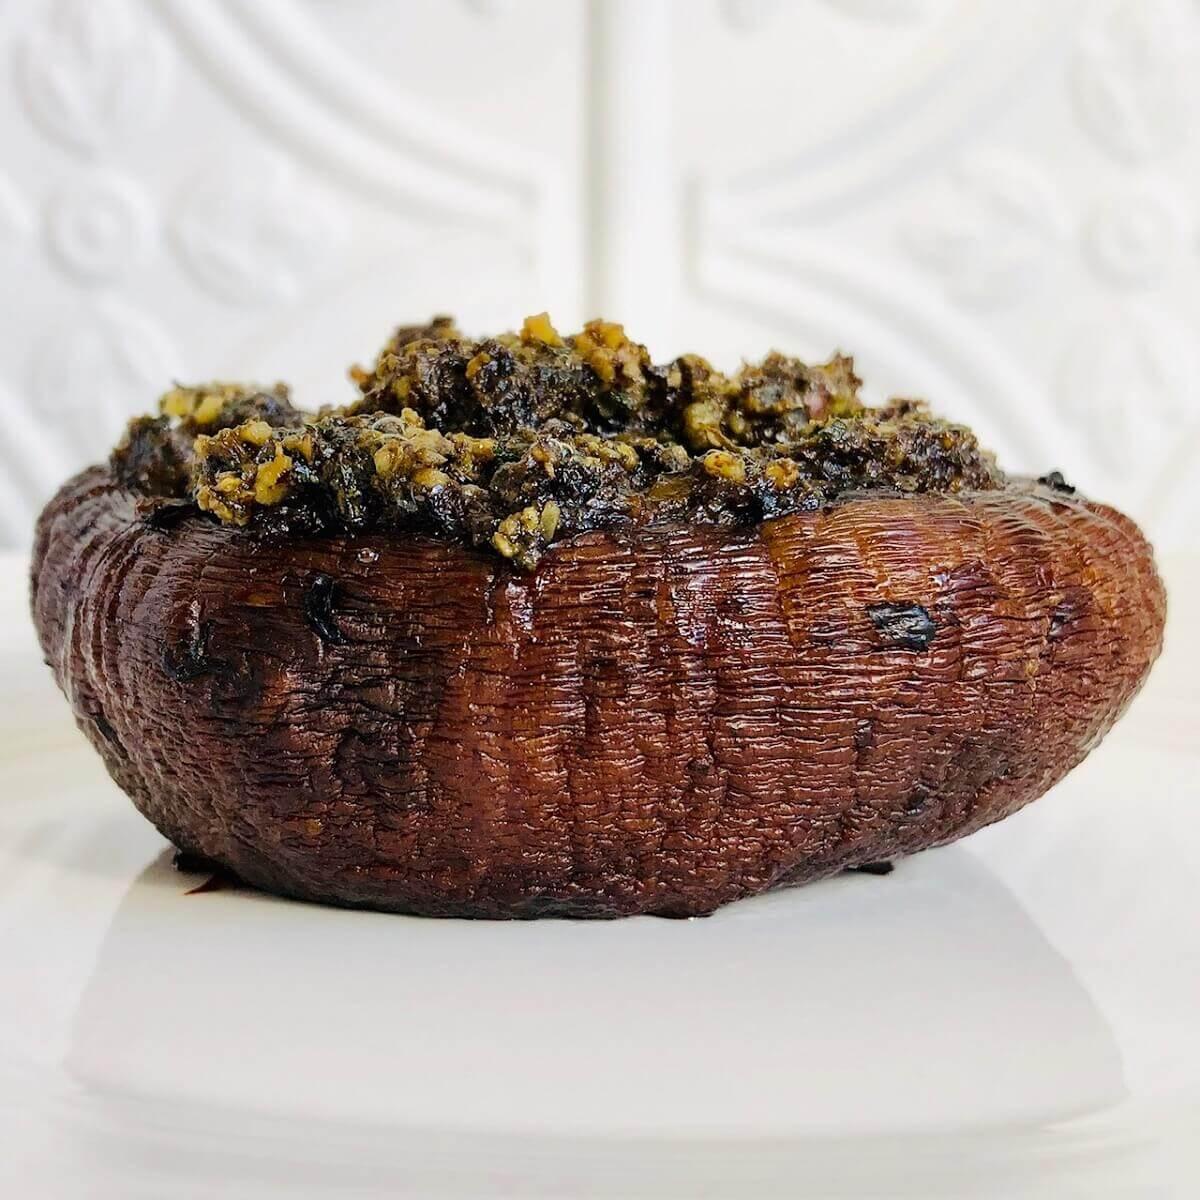 Vegan Stuffed Portobello Mushrooms A Sweet Alternative